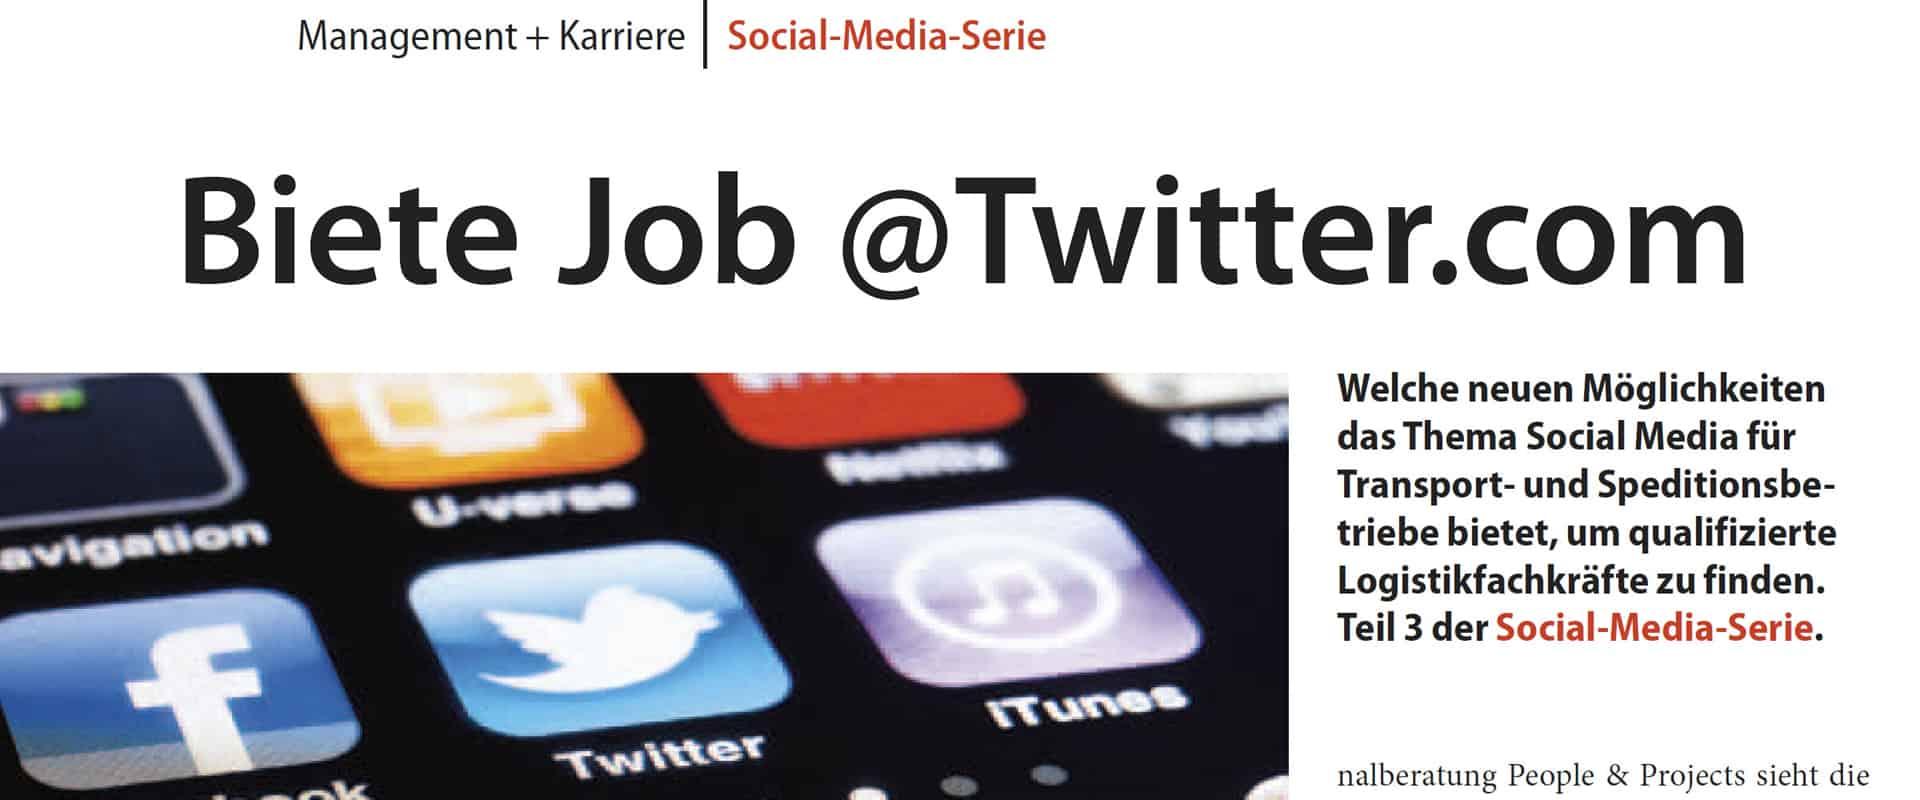 Blog-Artikel: Biete Job @ Twitter